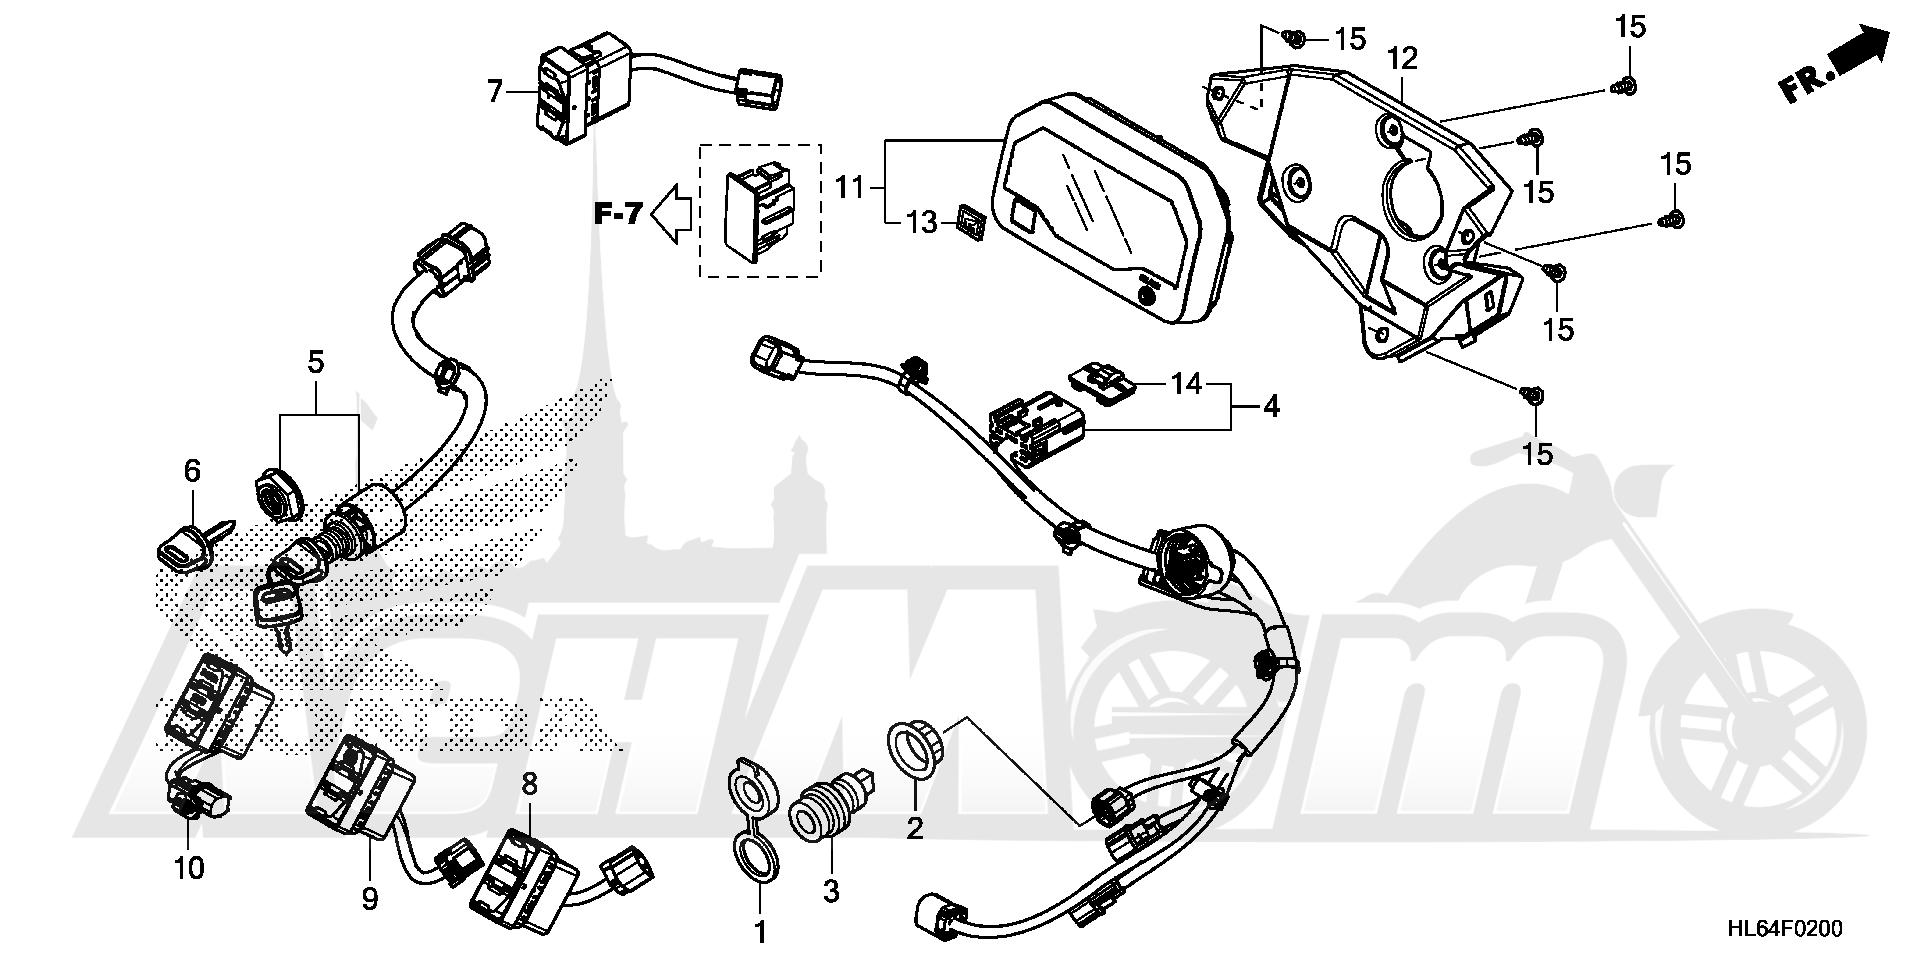 Запчасти для Квадроцикла Honda 2019 SXS1000S2X Раздел: METER AND SWITCH   счетчик и переключатель